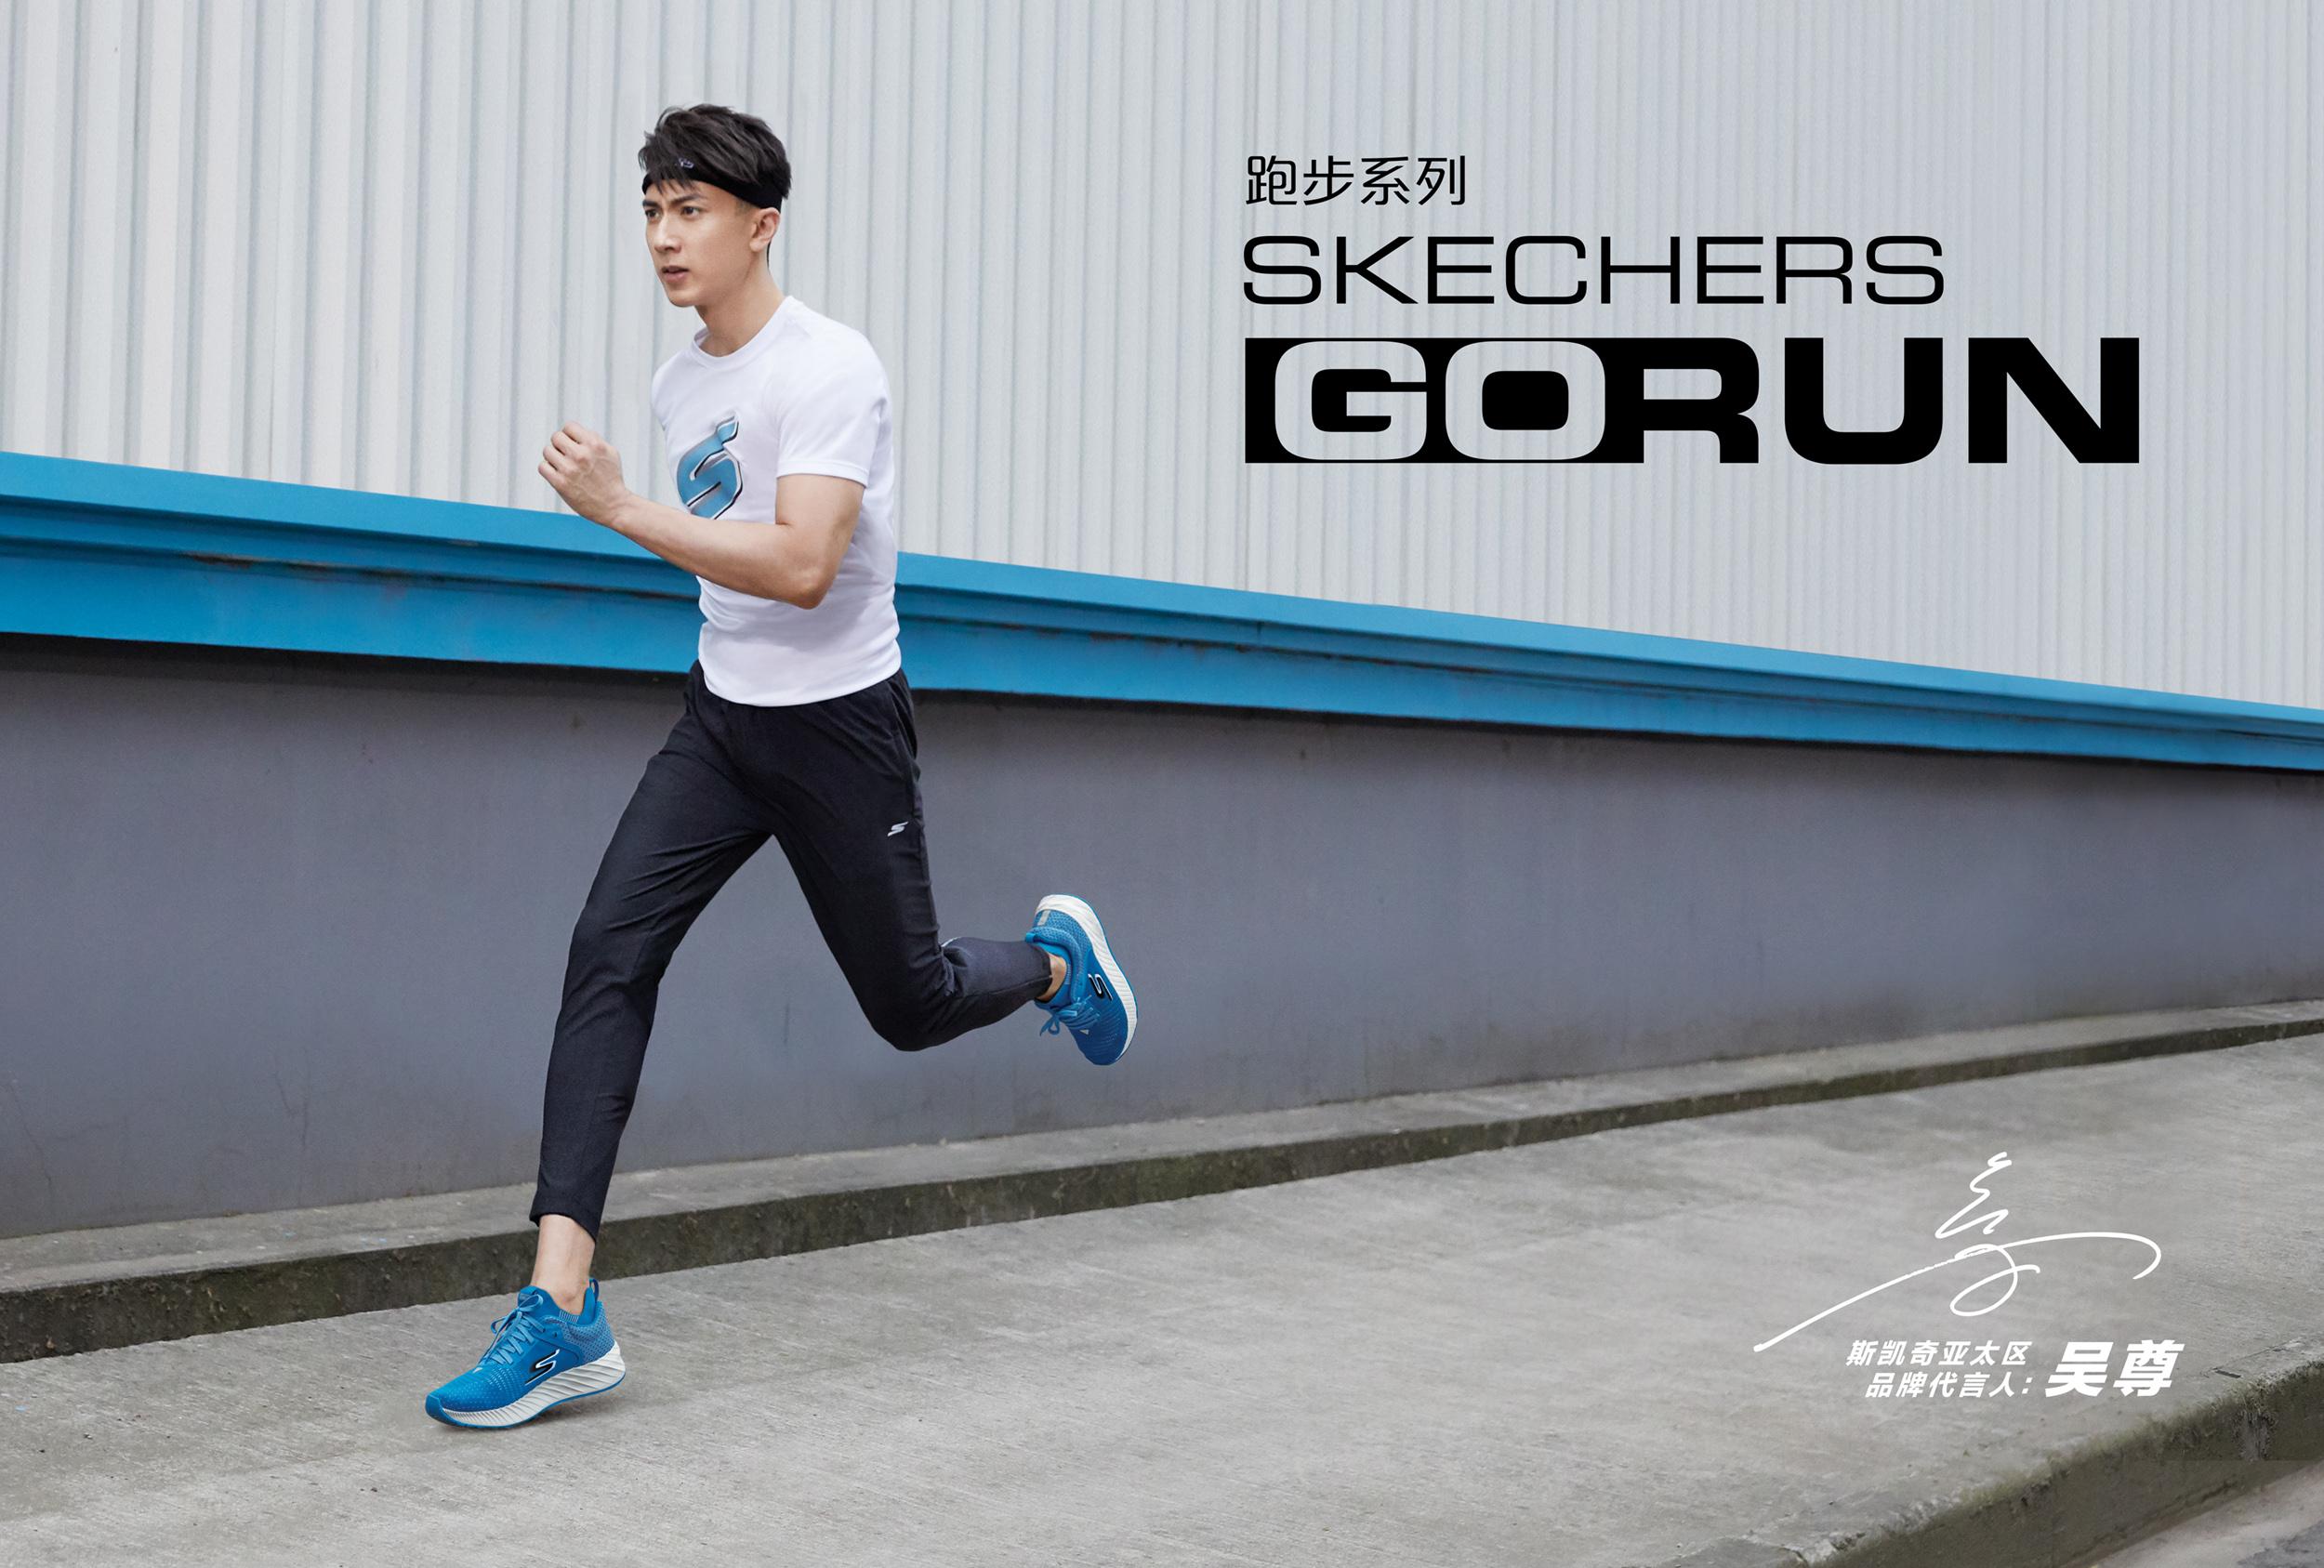 Skechers_2019Q3Q4_Running_h